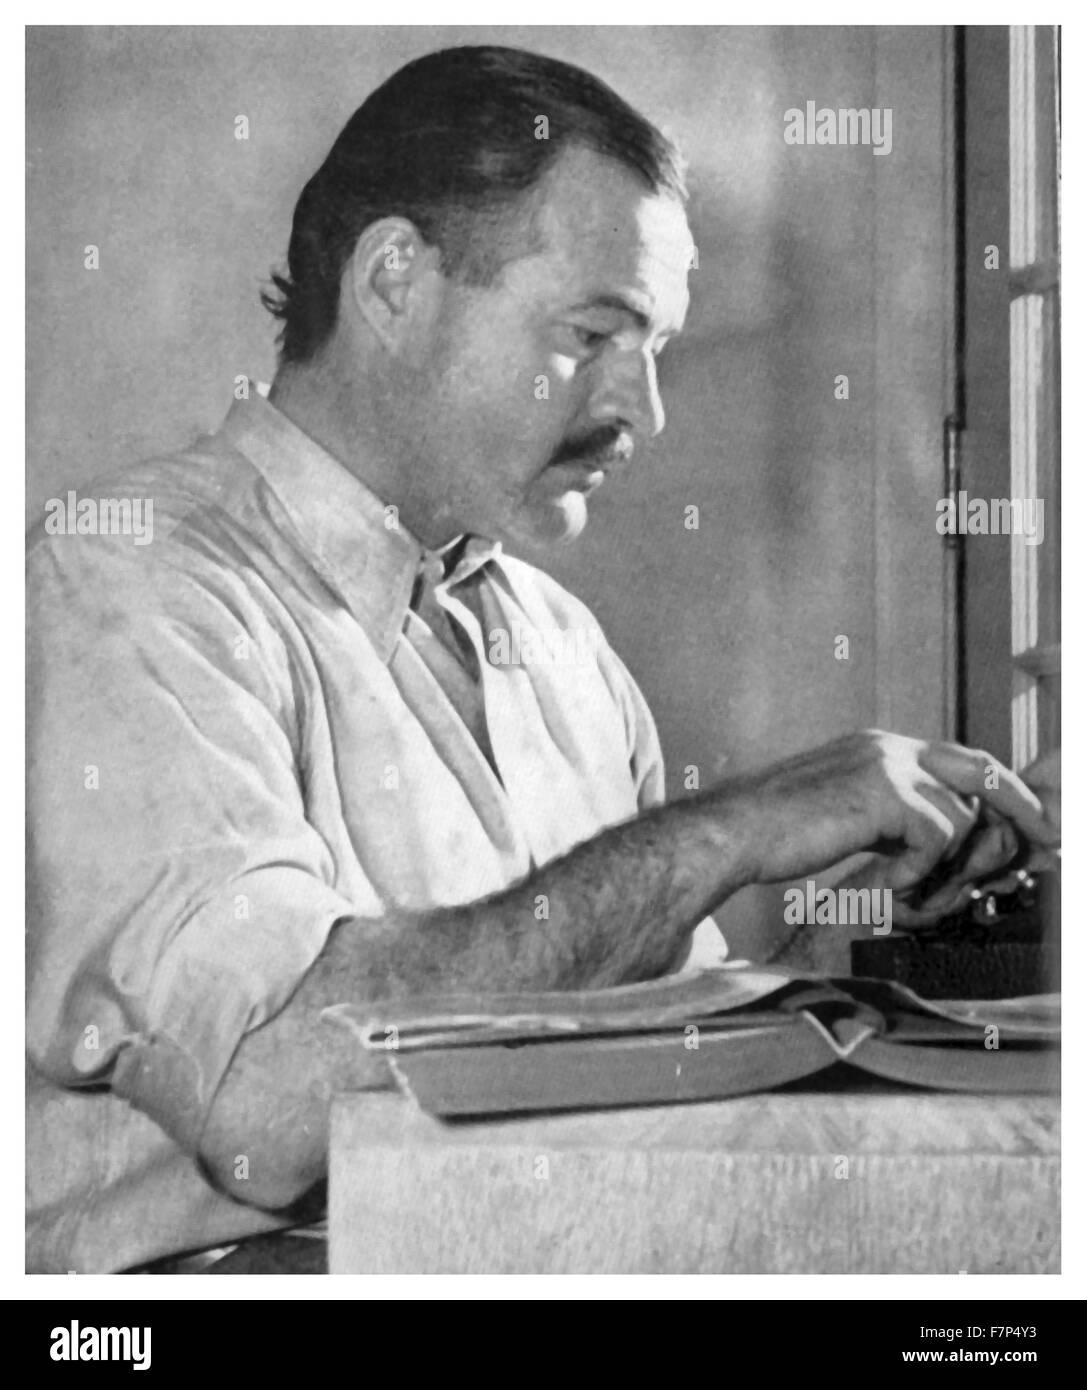 Ernest Hemingway (21st July 1899- 2nd July 1961) , American writer. - Stock Image